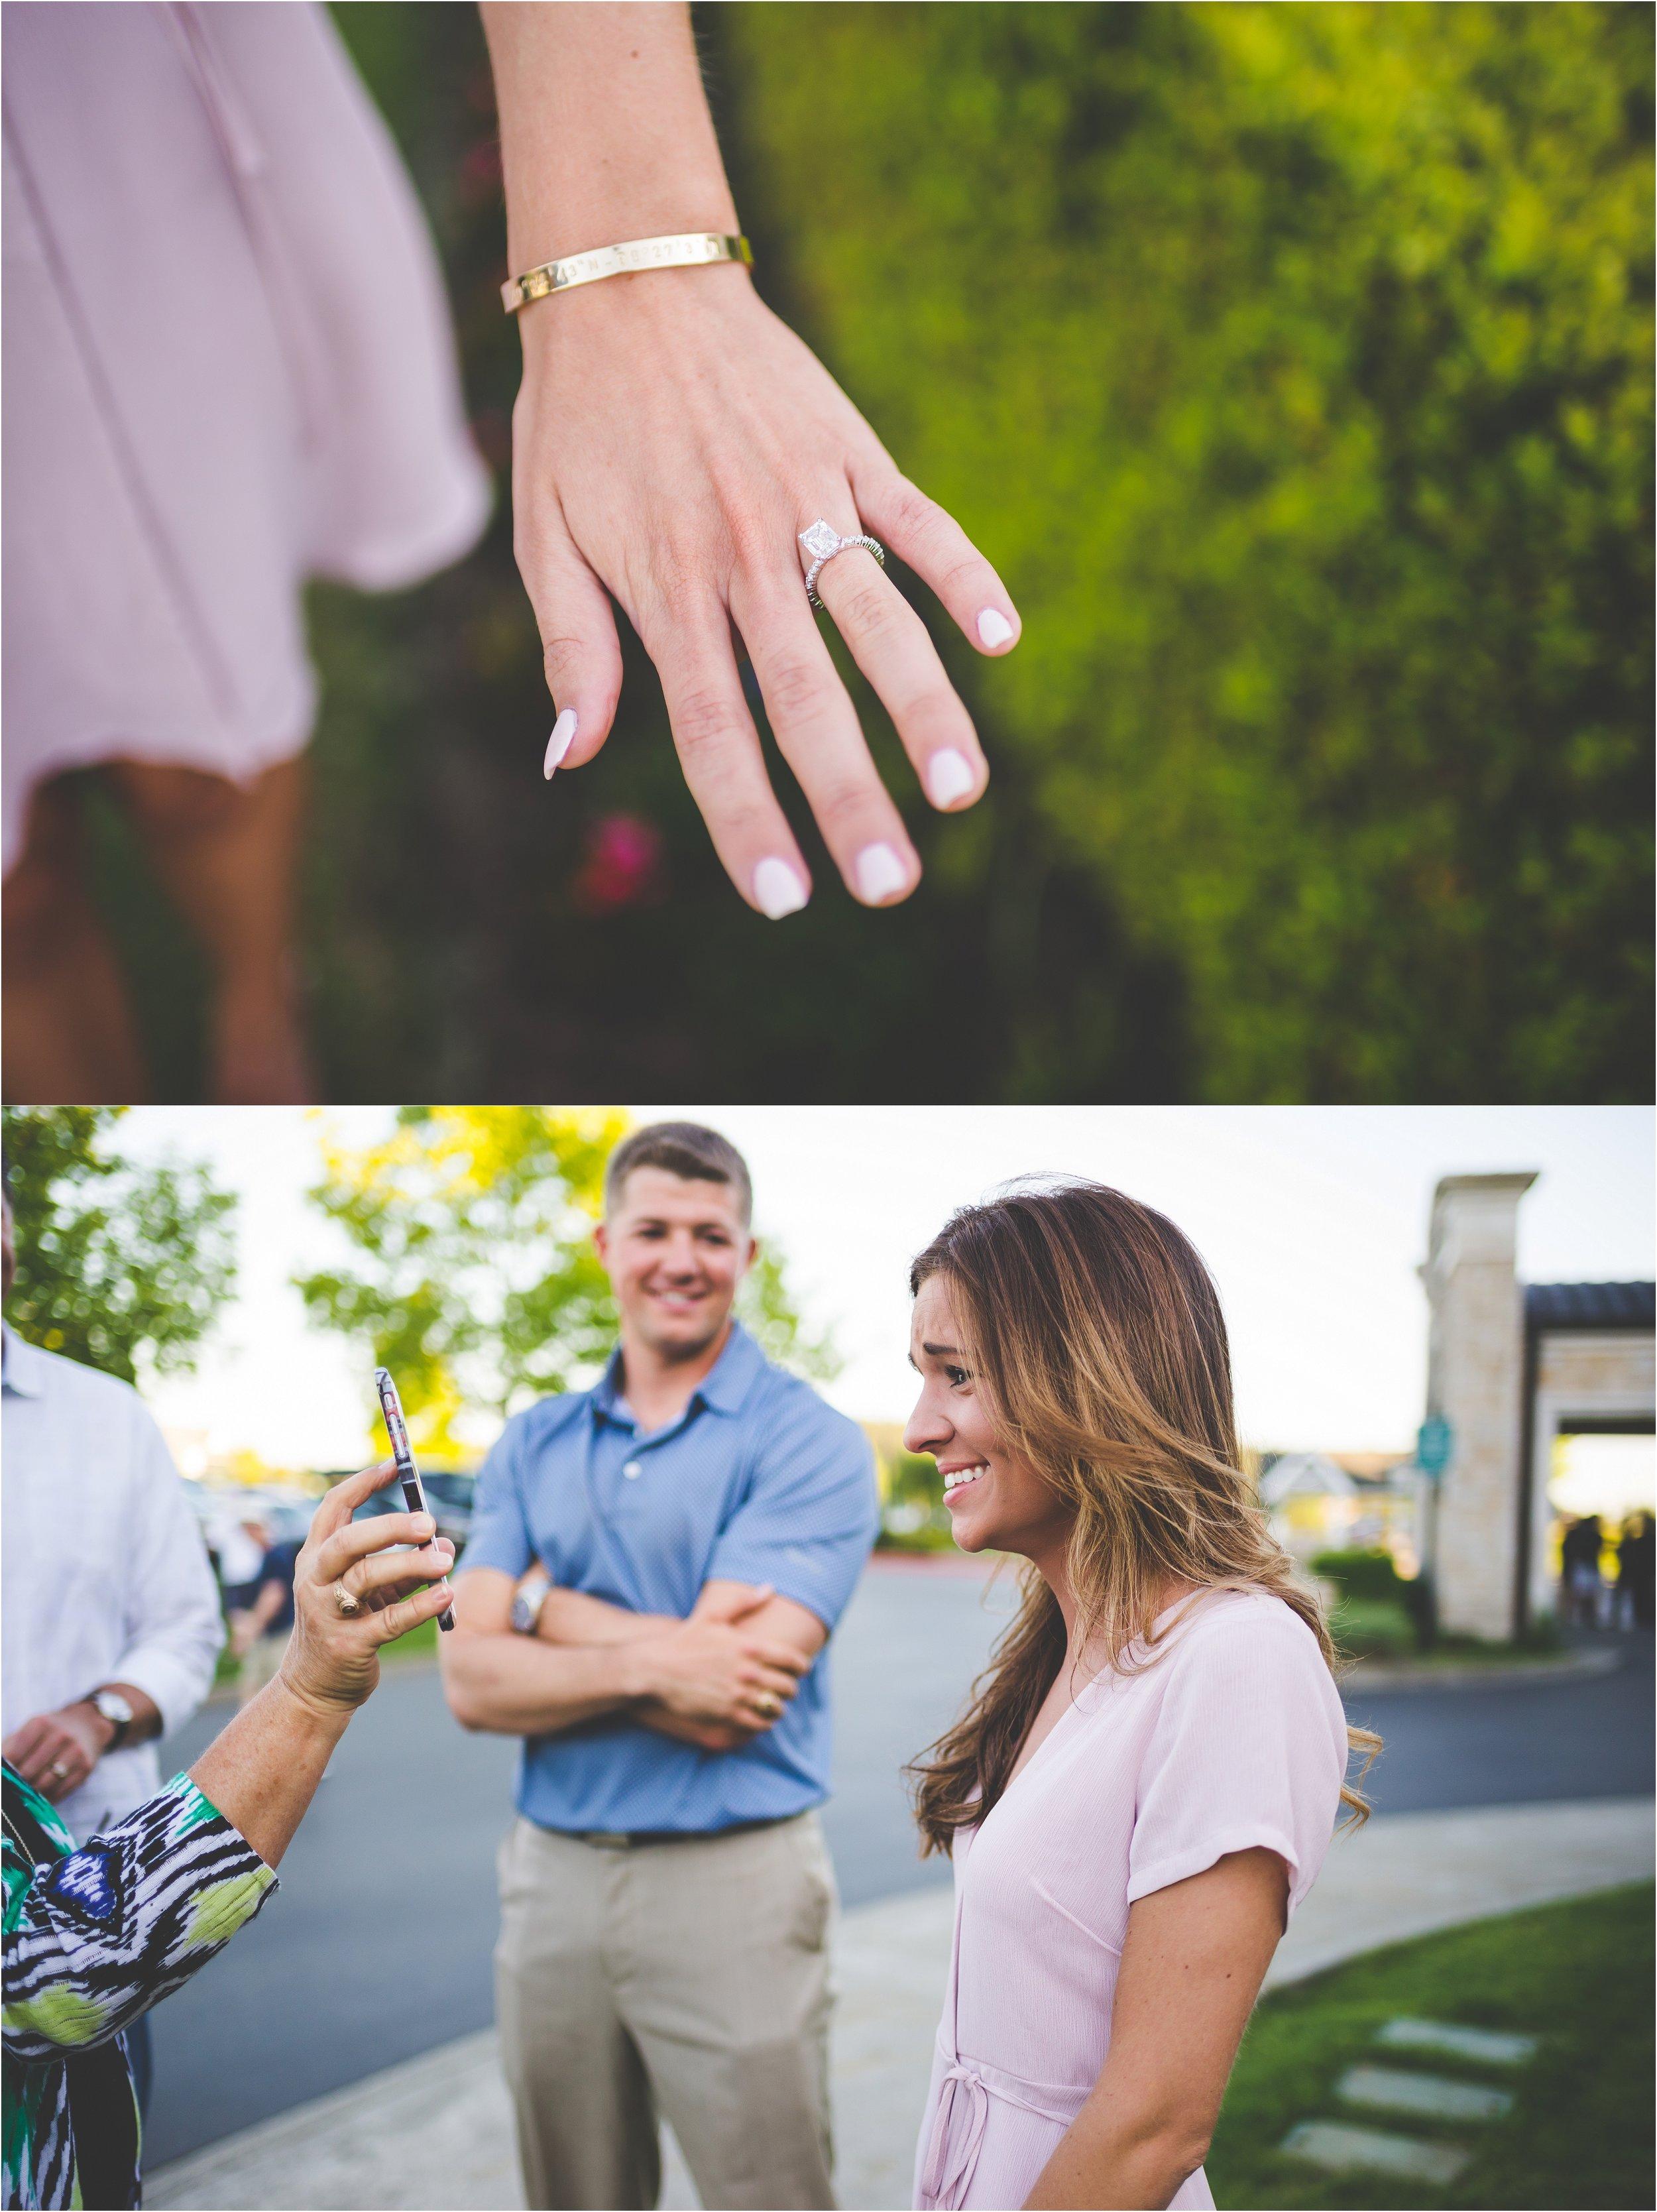 newcastle-golf-club-proposal-jannicka-mayte-seattle-washington-engagement-wedding-photographer_0047.jpg